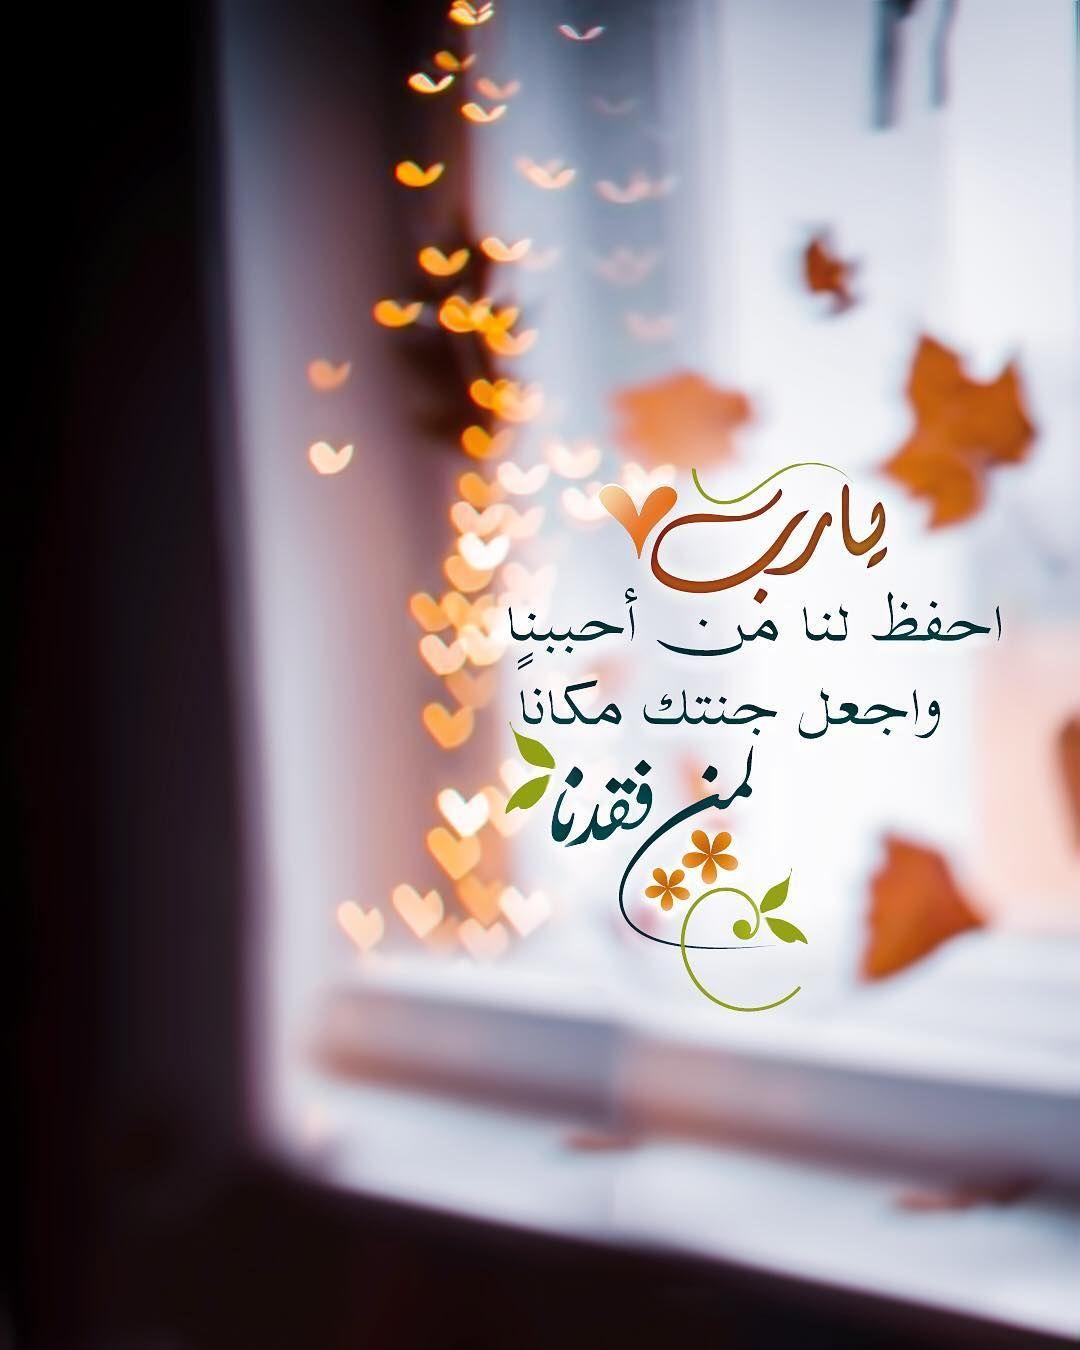 Pearla0203 On Instagram يارب احفظ لنا من أحببنا واجعل جنتك مكانا لمن فقدنا ㅤㅤㅤㅤㅤㅤㅤ Islamic Quotes Wallpaper Islamic Images Good Morning Arabic